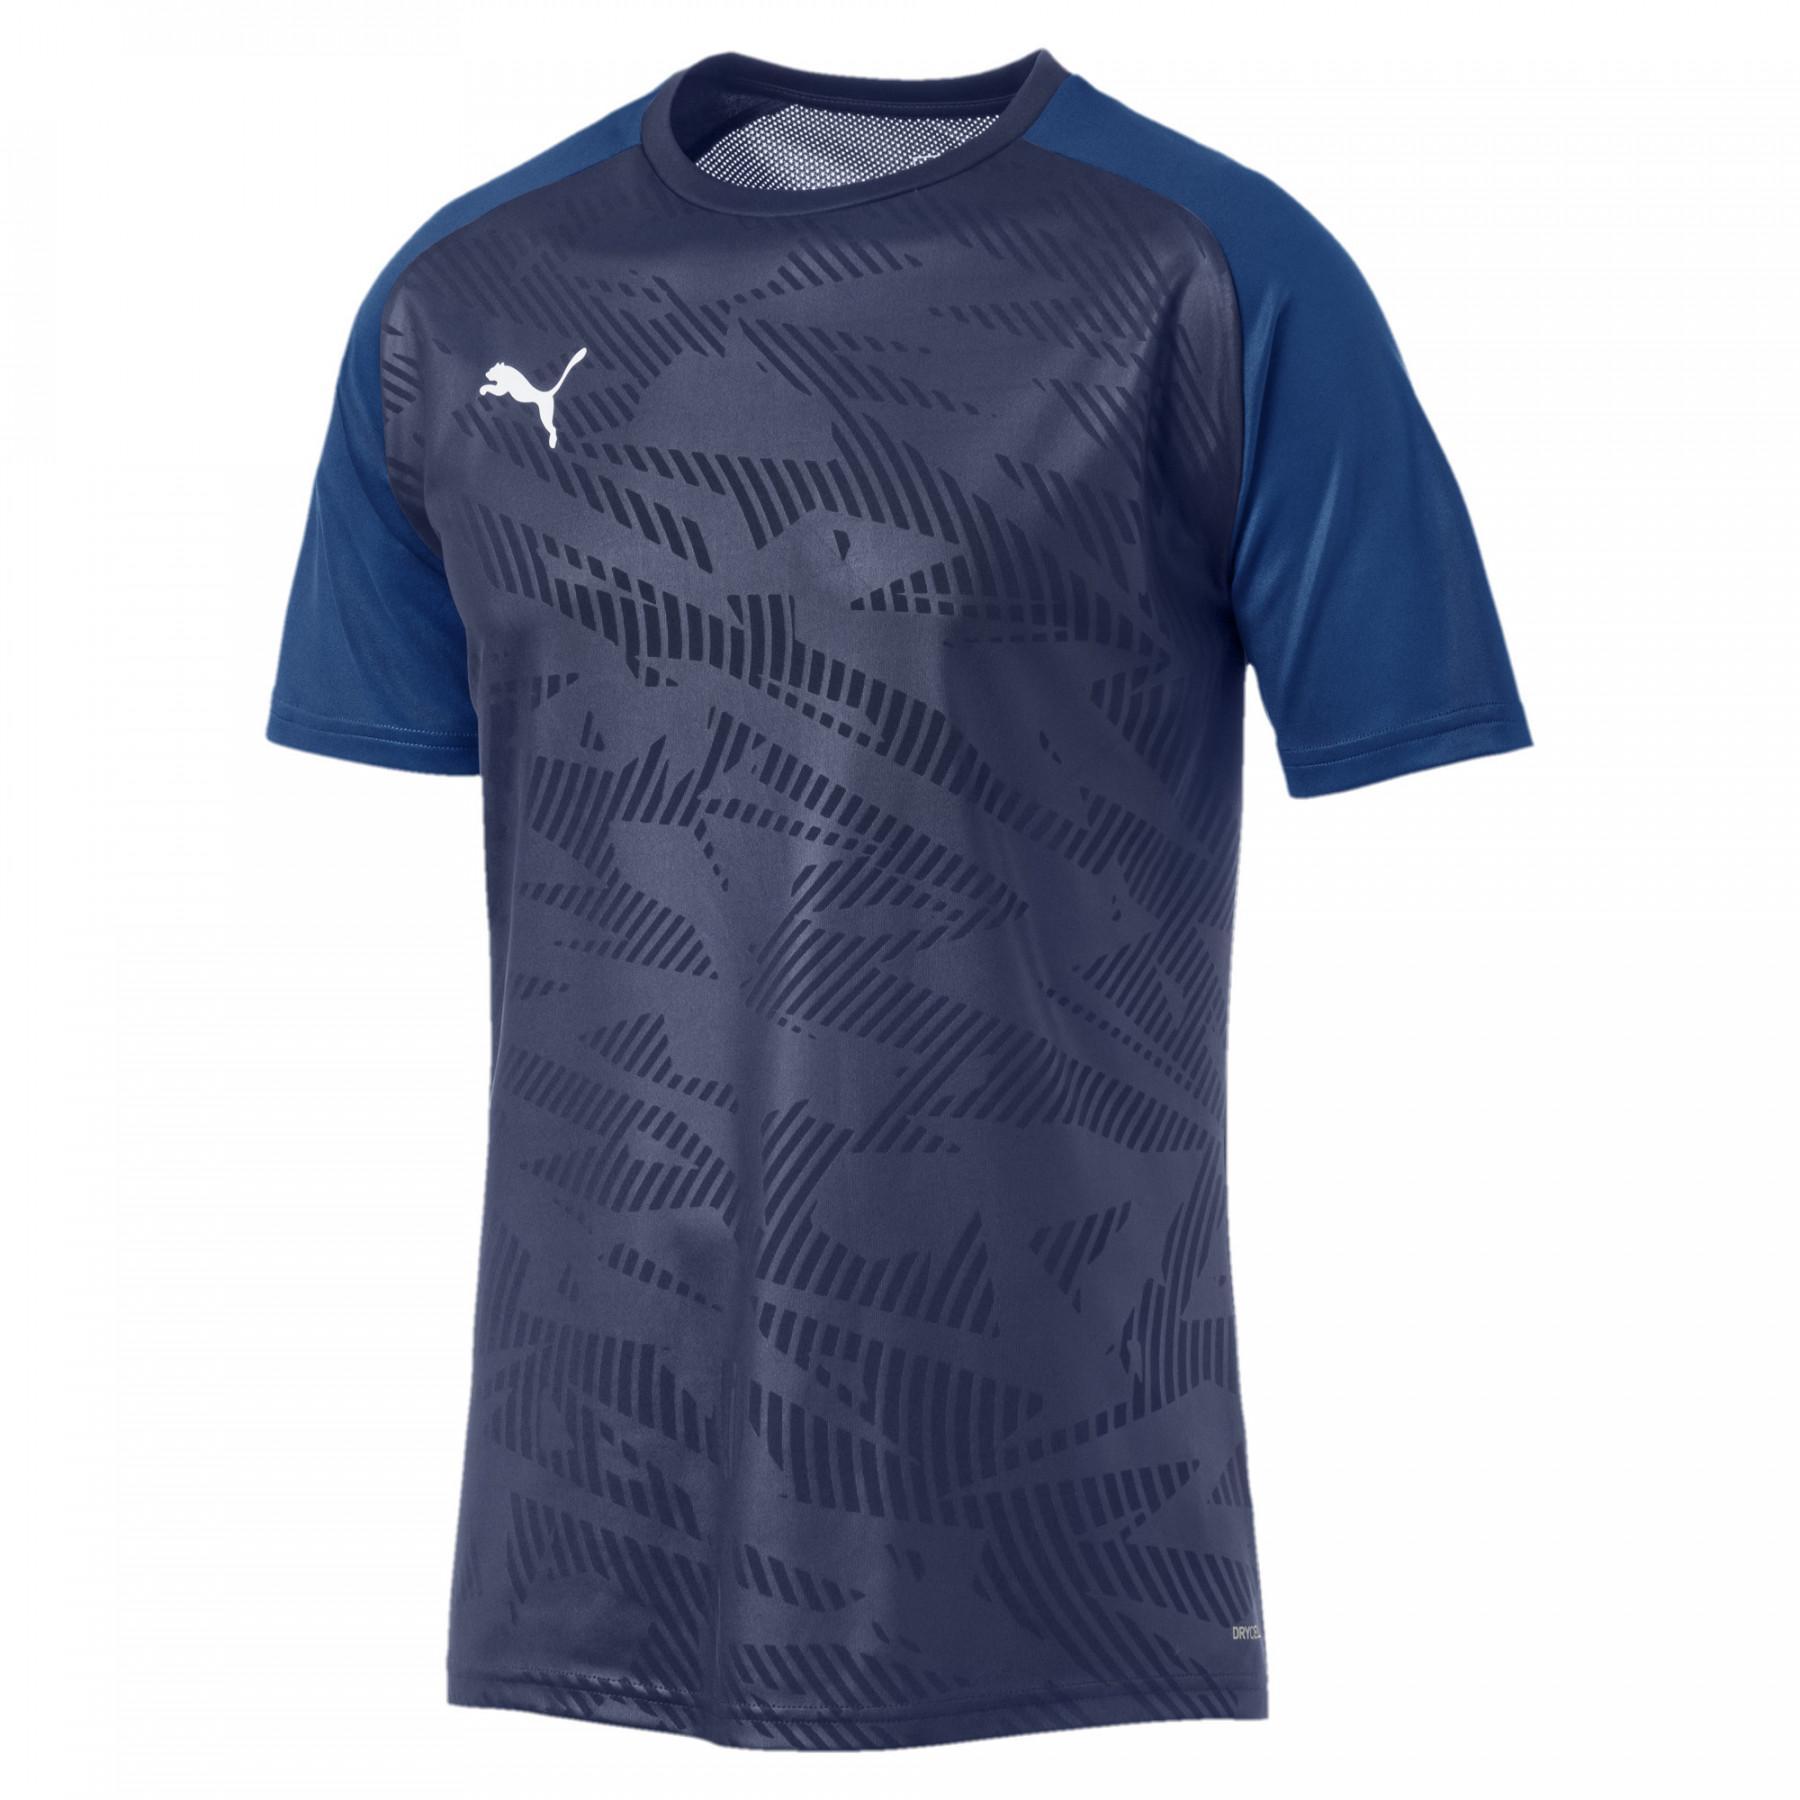 Puma jersey training CUP